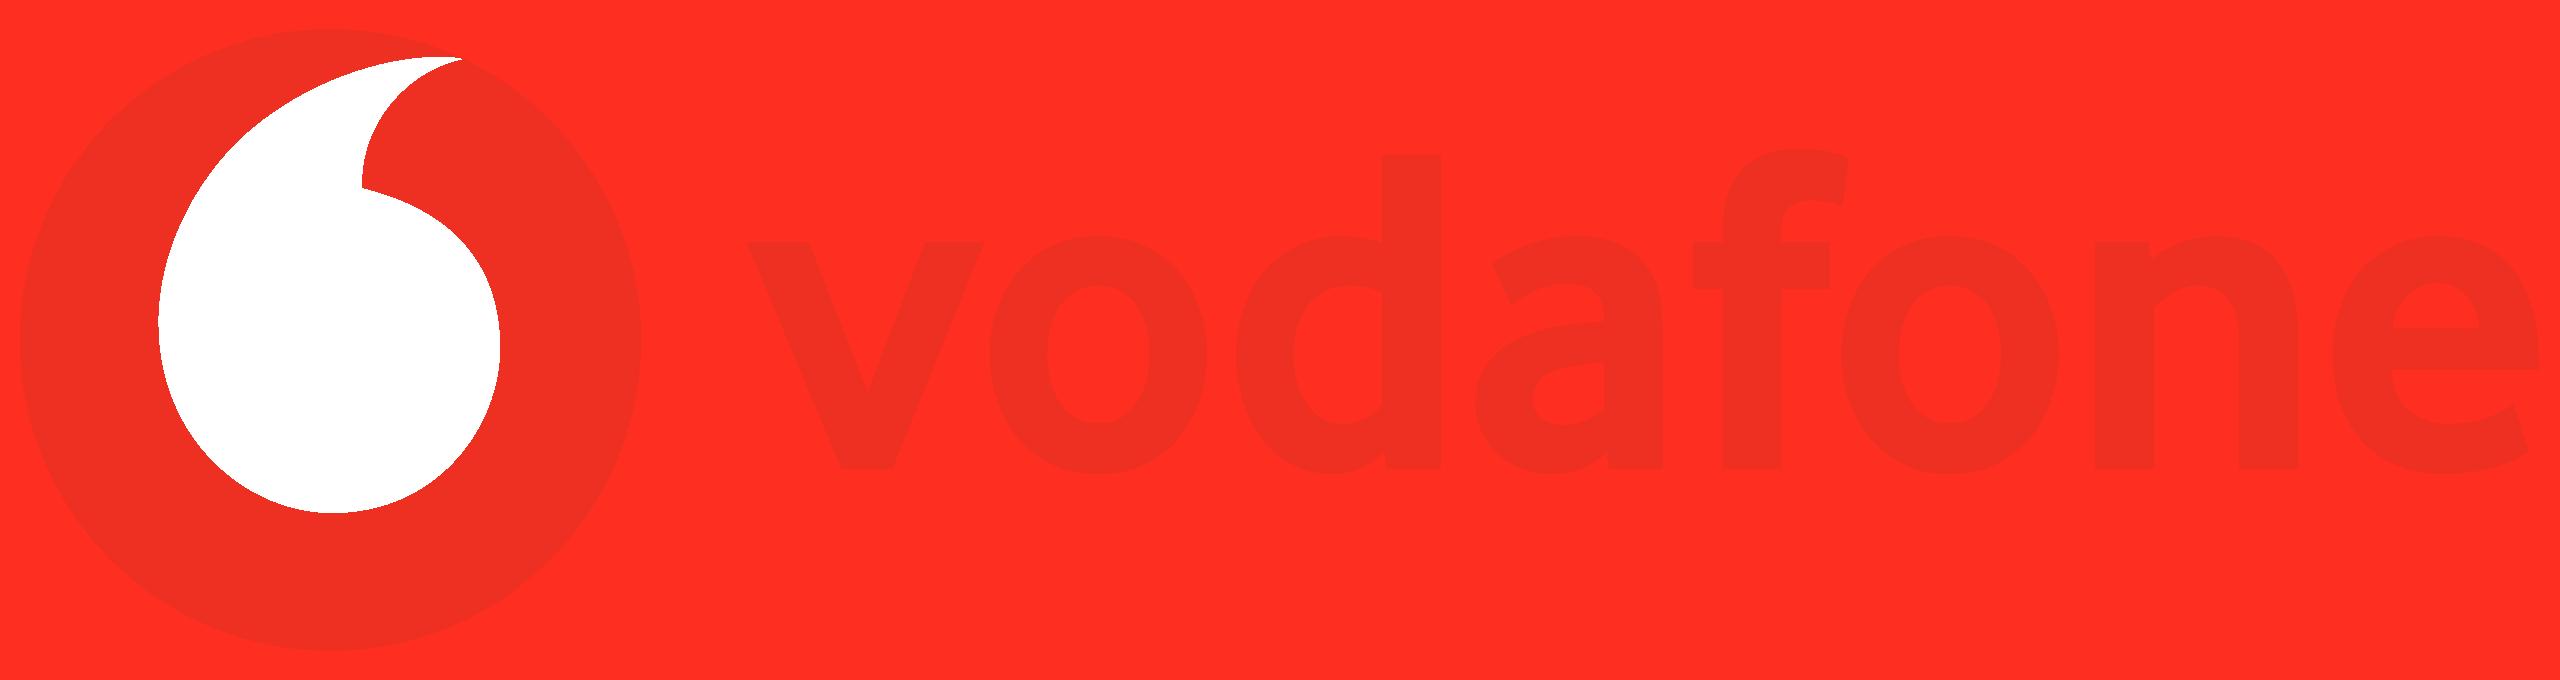 Vodafone student discounts logo